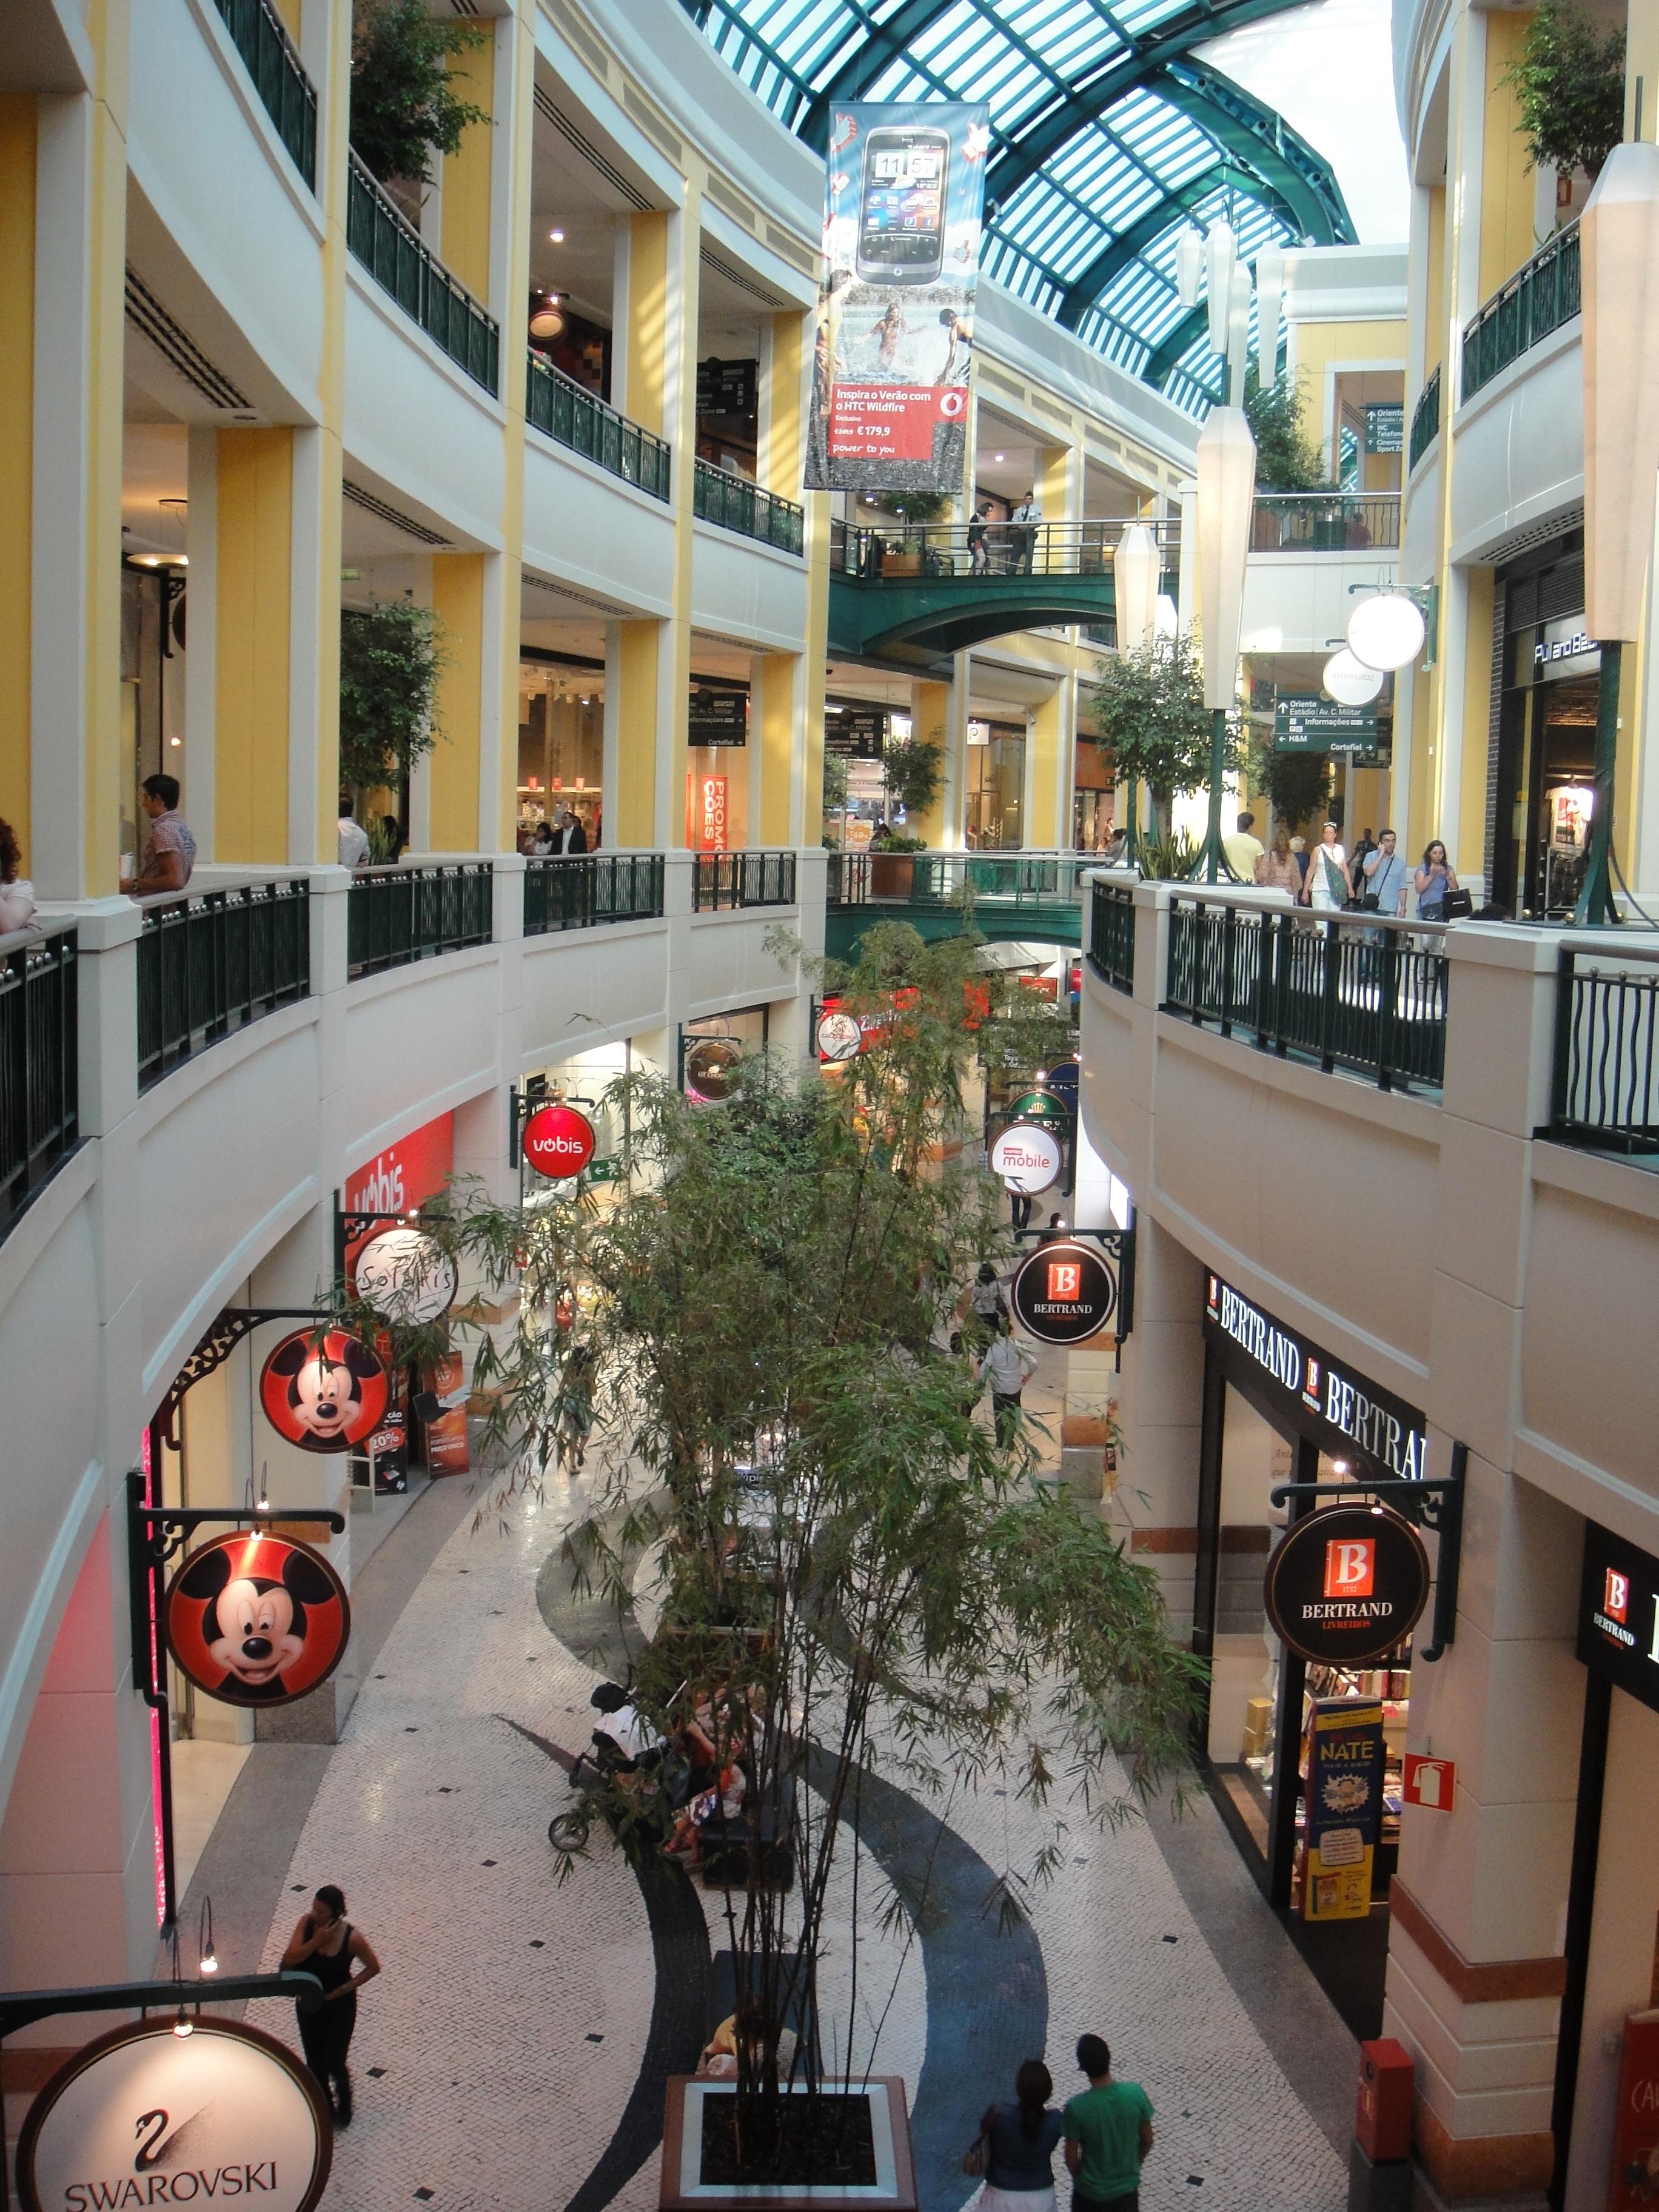 free images building plaza lisbon retail colombo